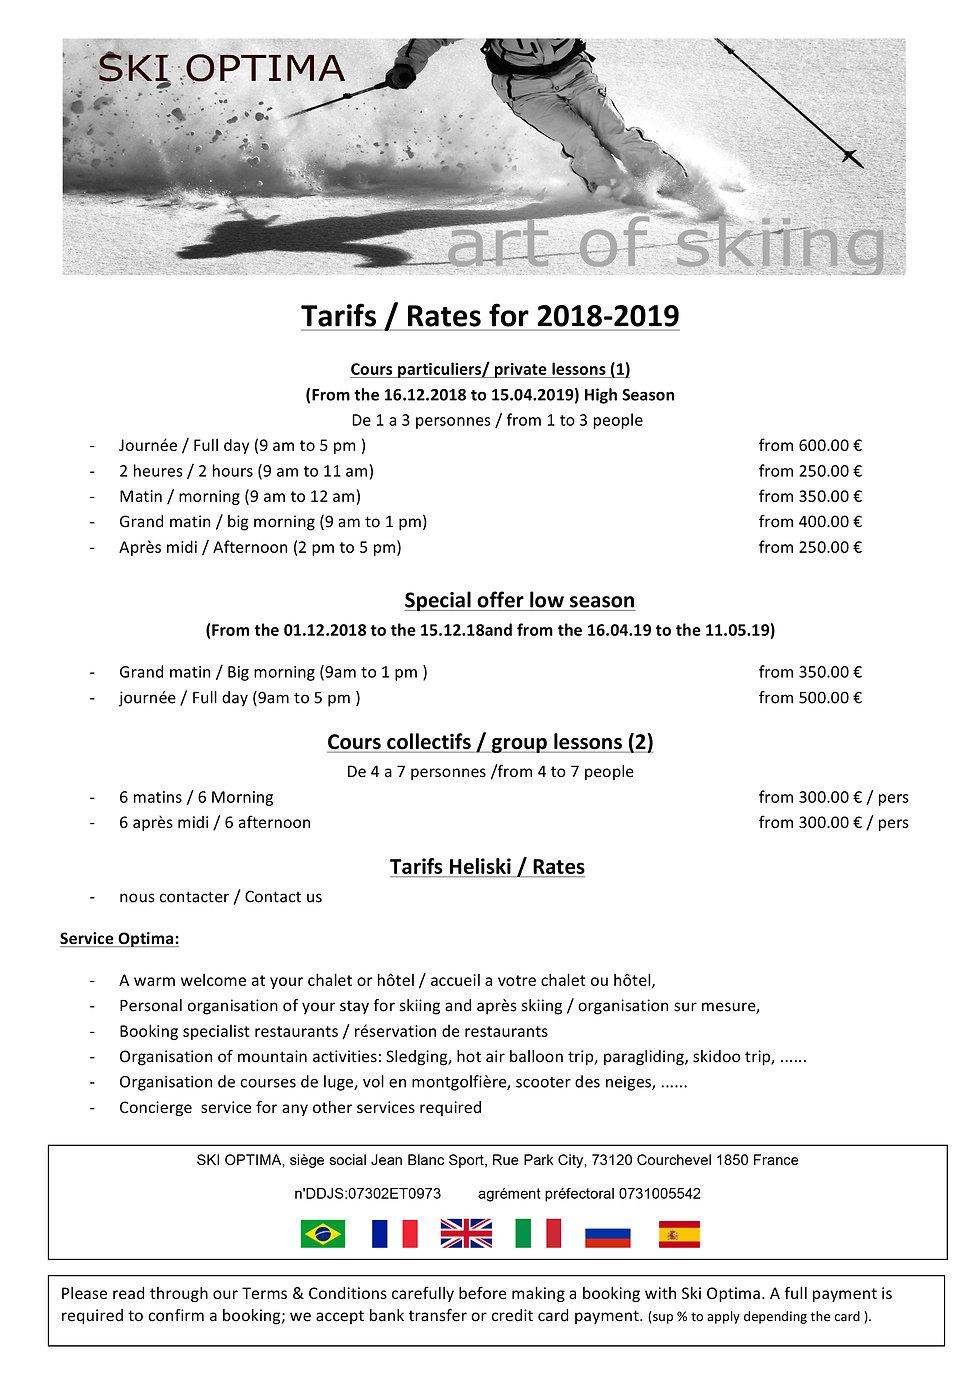 tarif ski optima 2018.2019.jpg